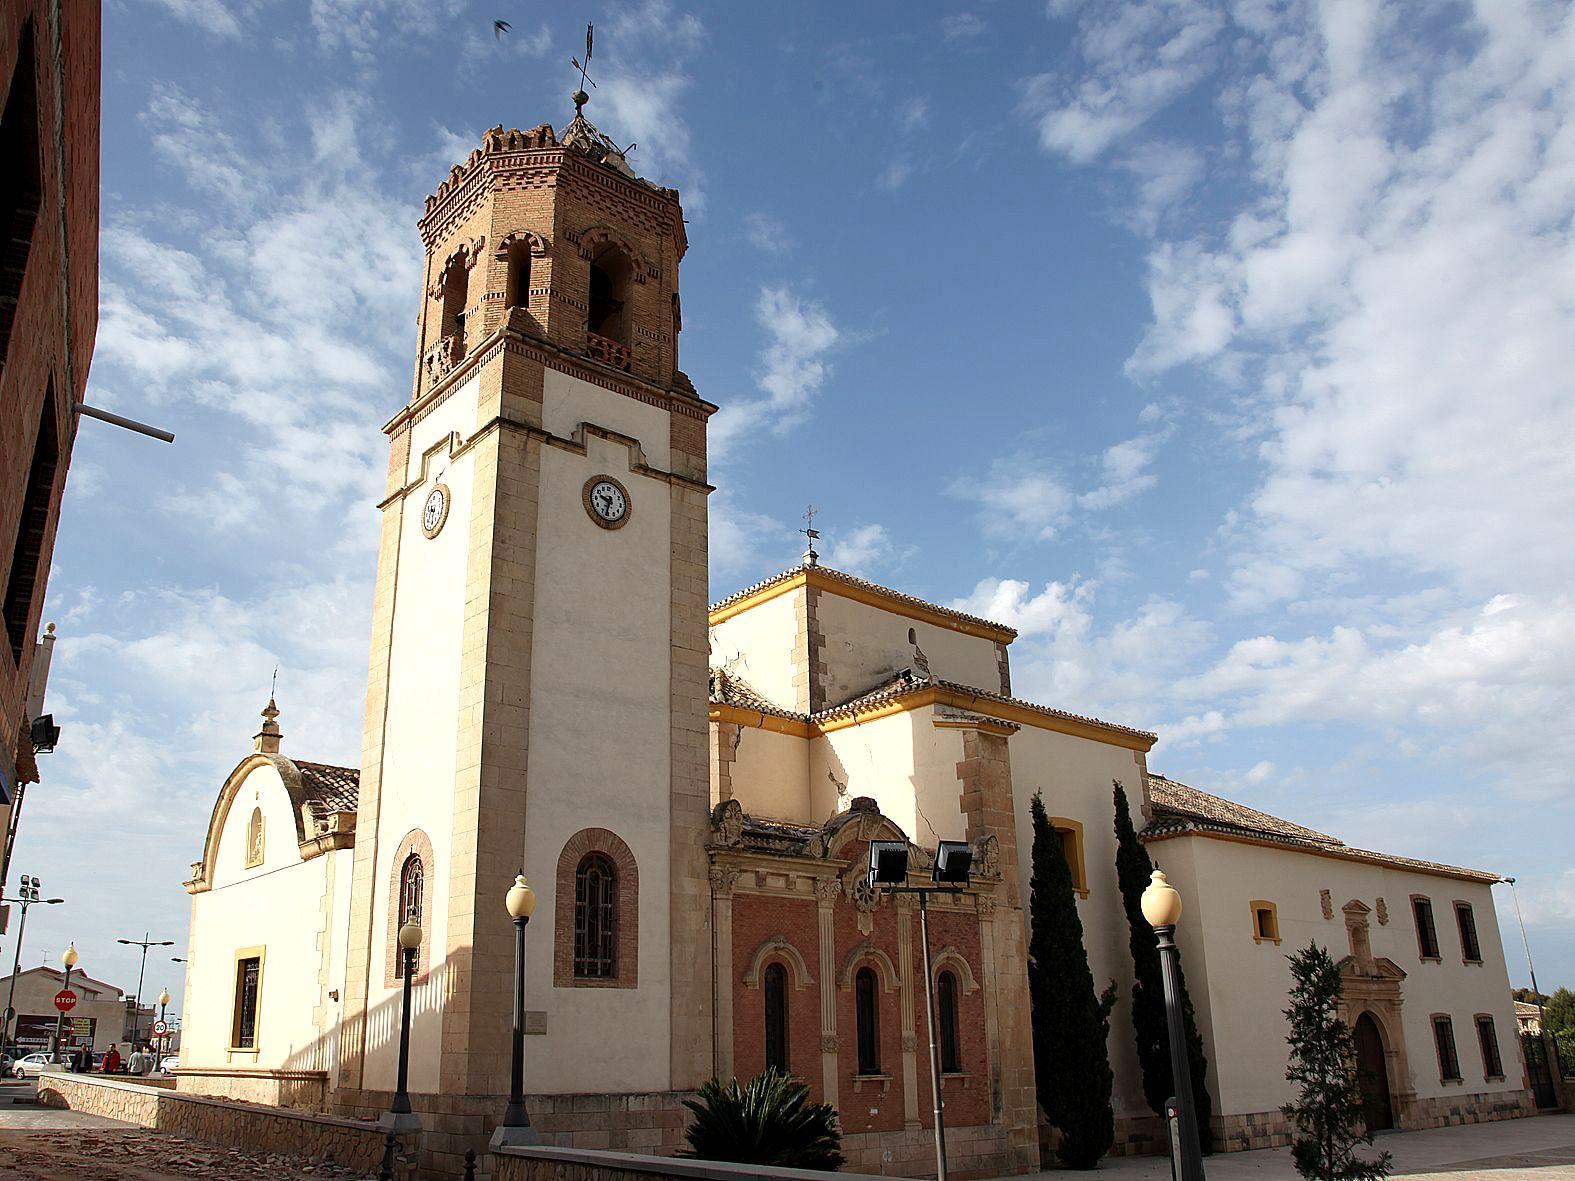 Santuario virgen de las huertas lorca murcia espa a - Lorca murcia fotos ...